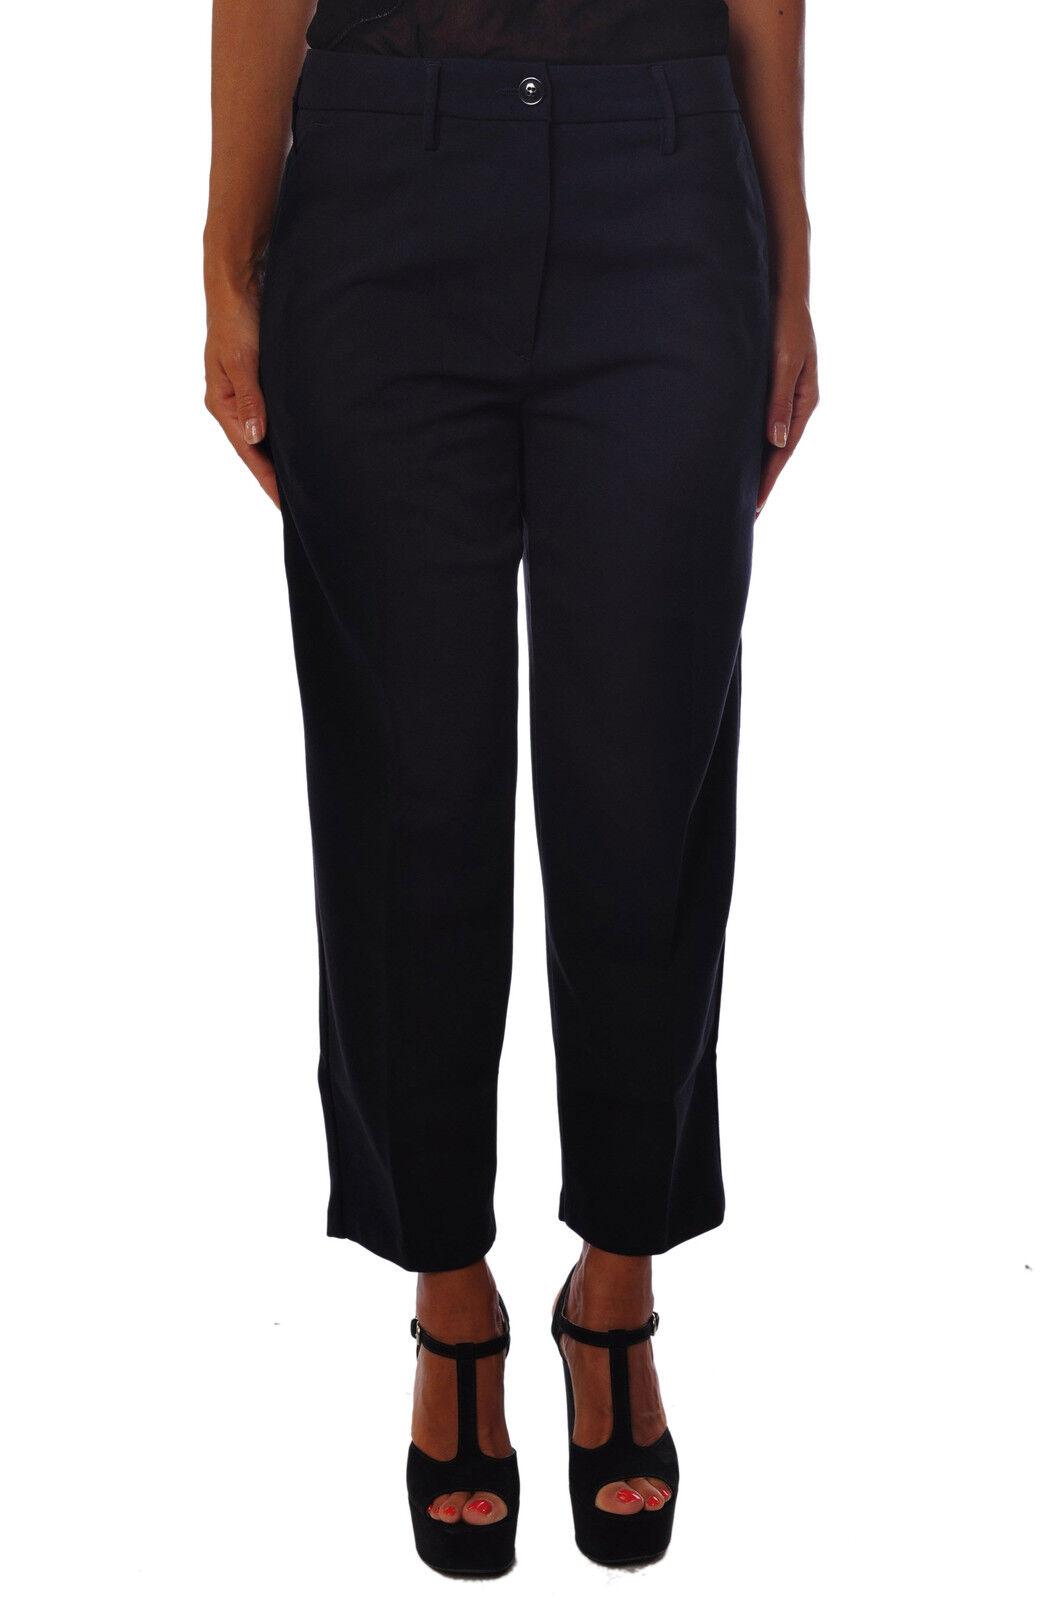 Department 5 - Pants-Pants - Woman - bluee - 1510310C190840